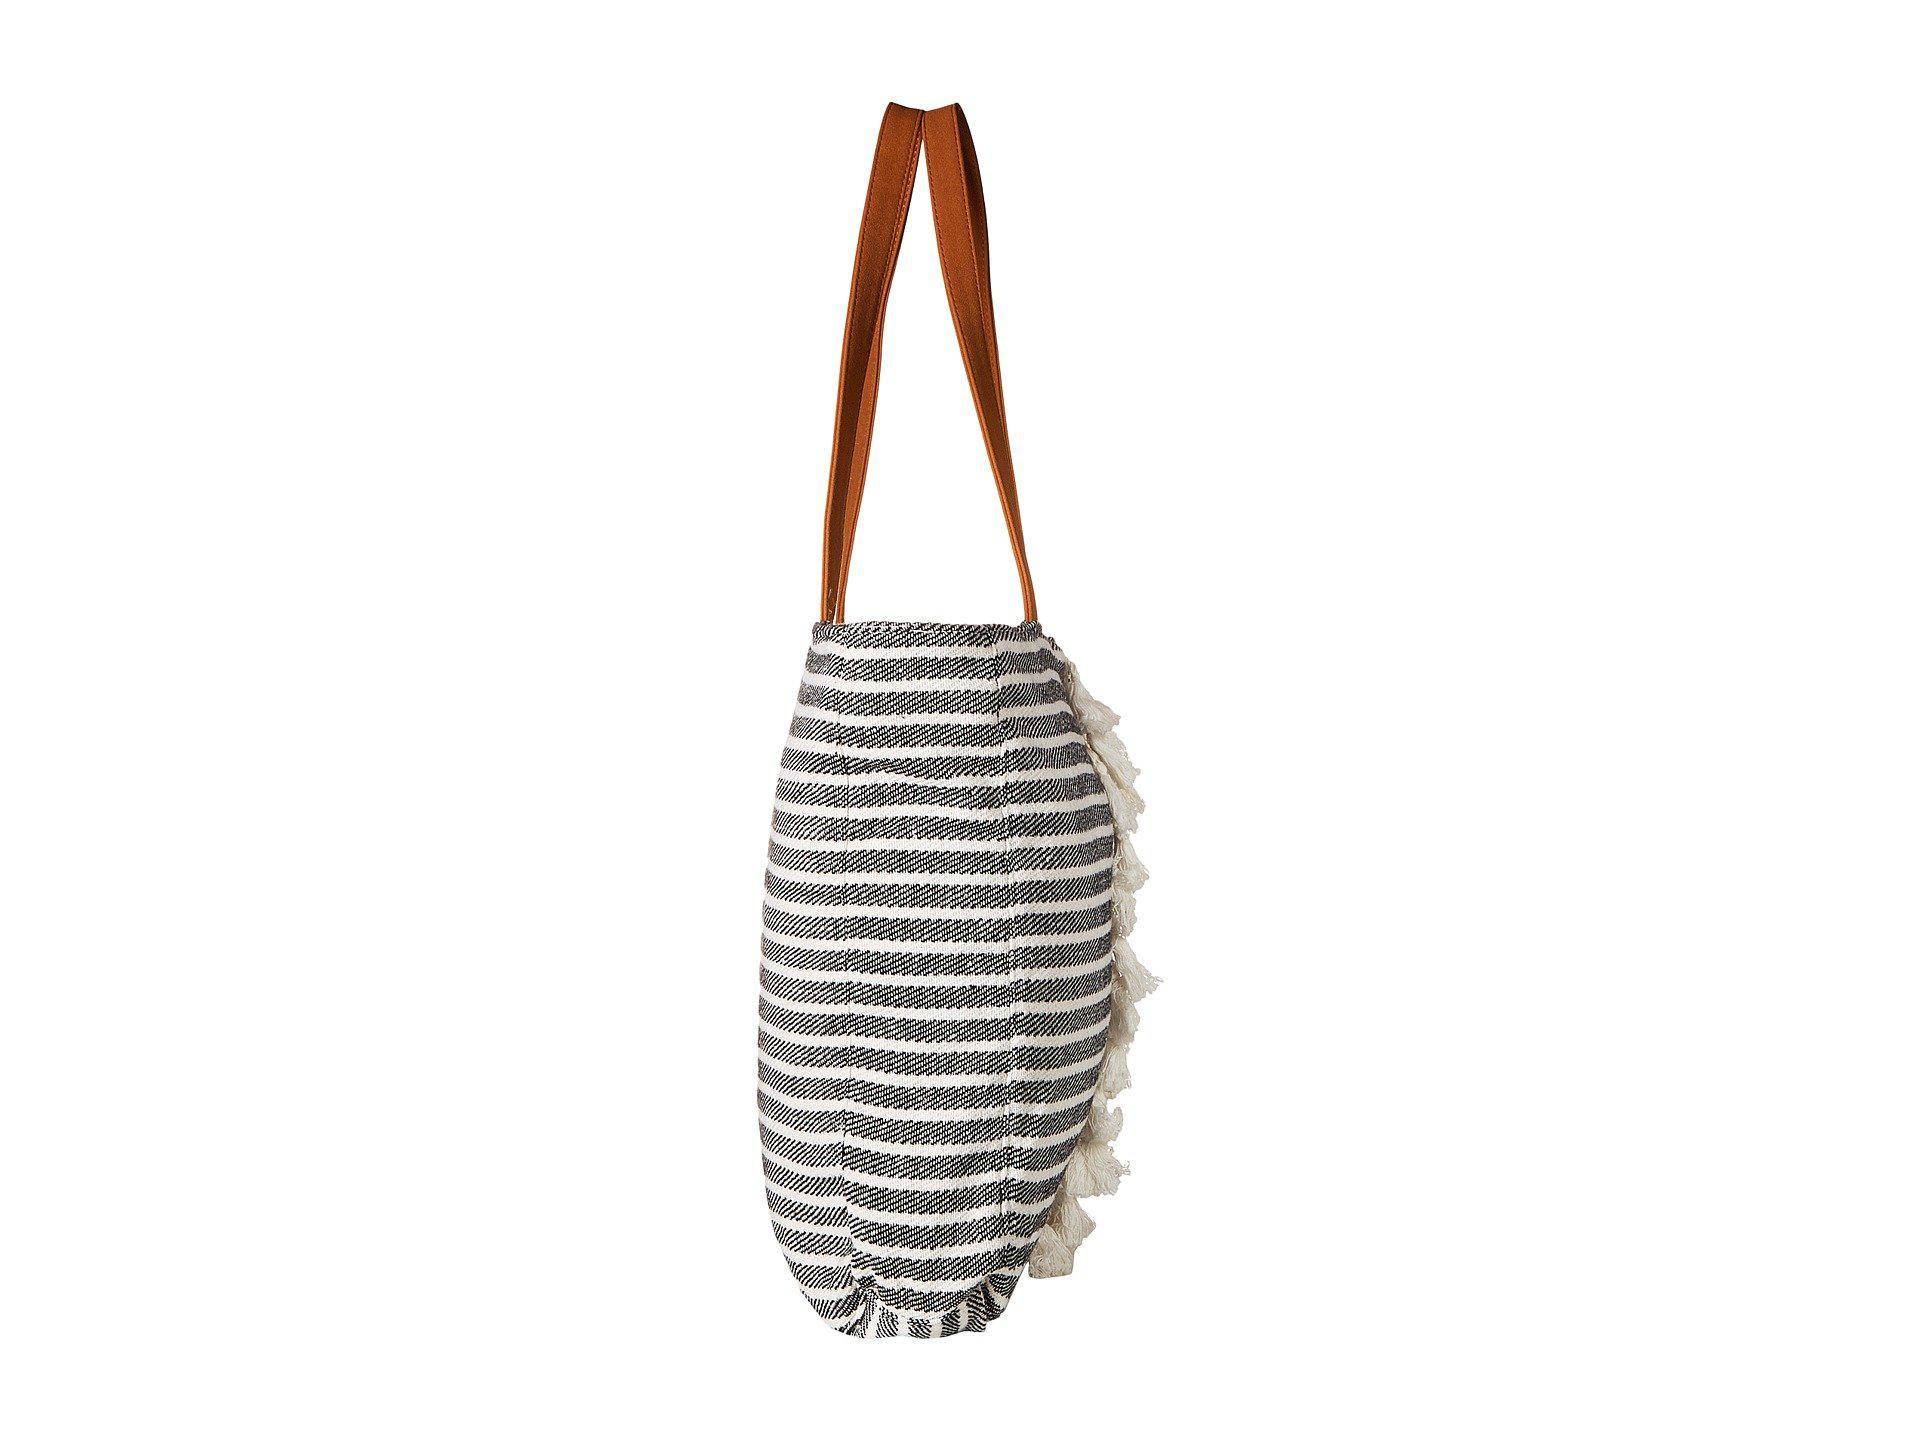 Lyst - Roxy Catch On Fire Medium Tote Bag (true Black) Tote Handbags ... 7ffaee4fe4dfb